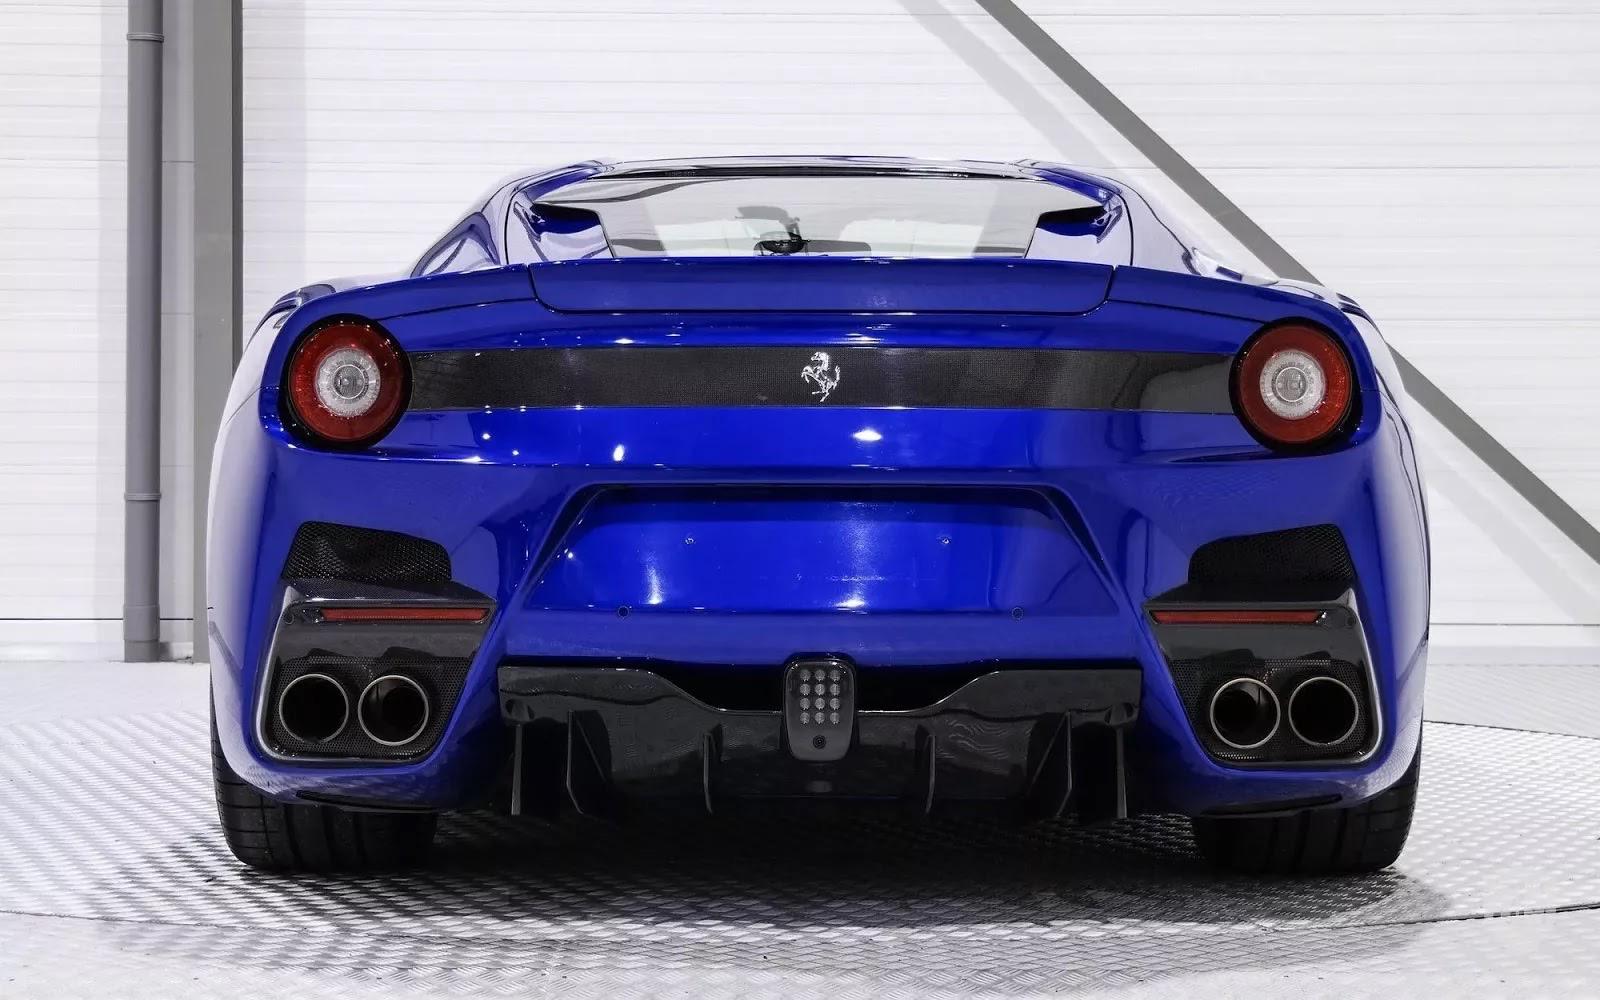 One-Off_Electric_Blue_Ferrari_F12tdf_05